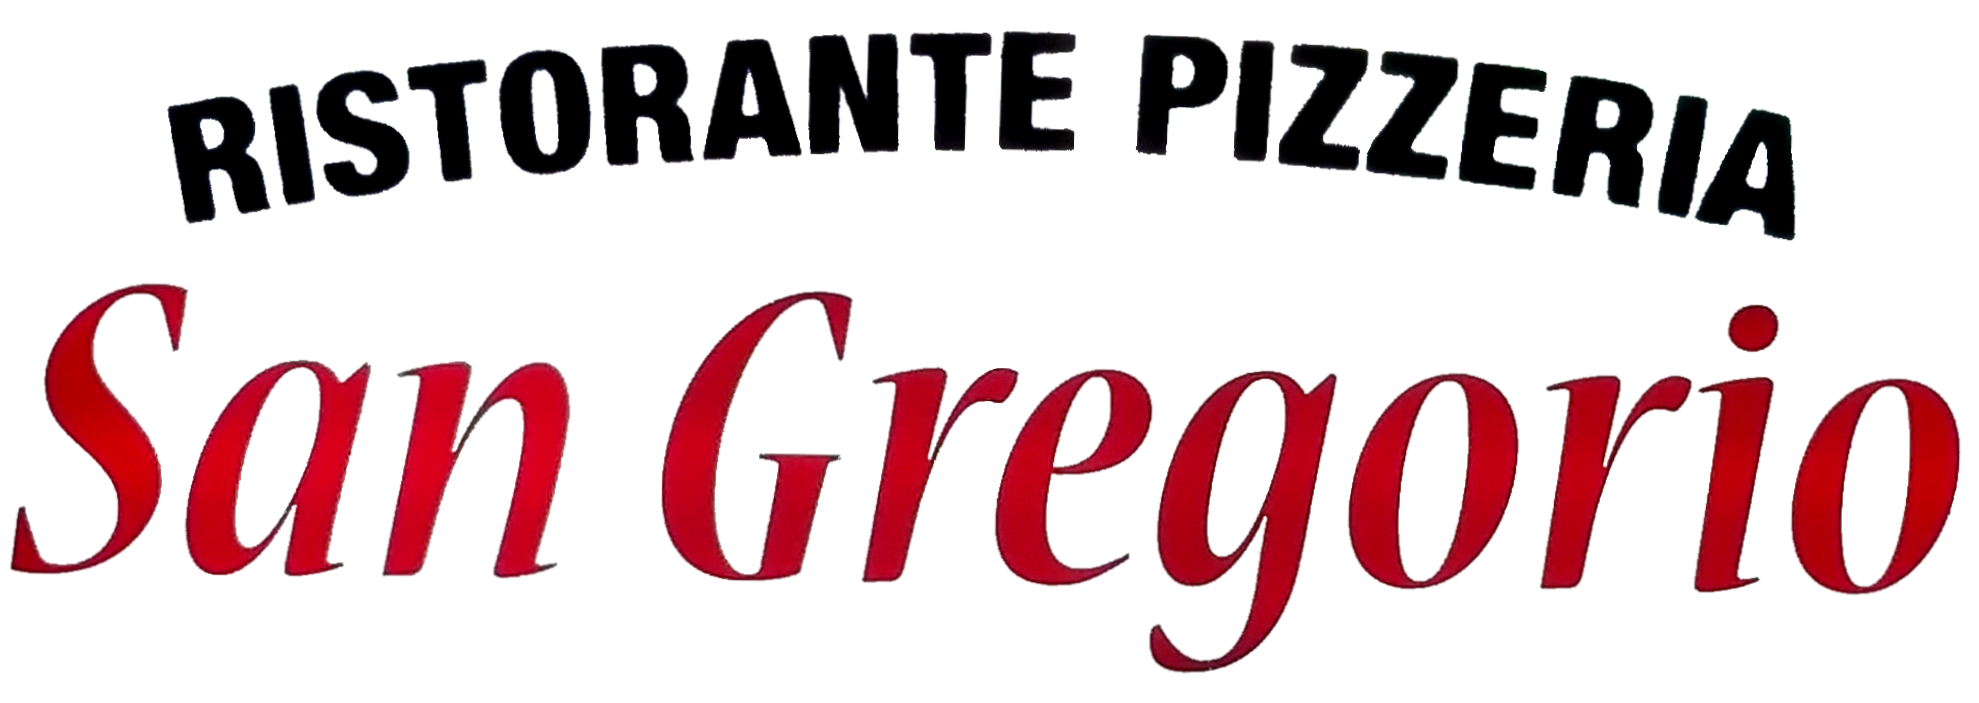 Ristorante San Gregorio – Correggio (Reggio Emilia)